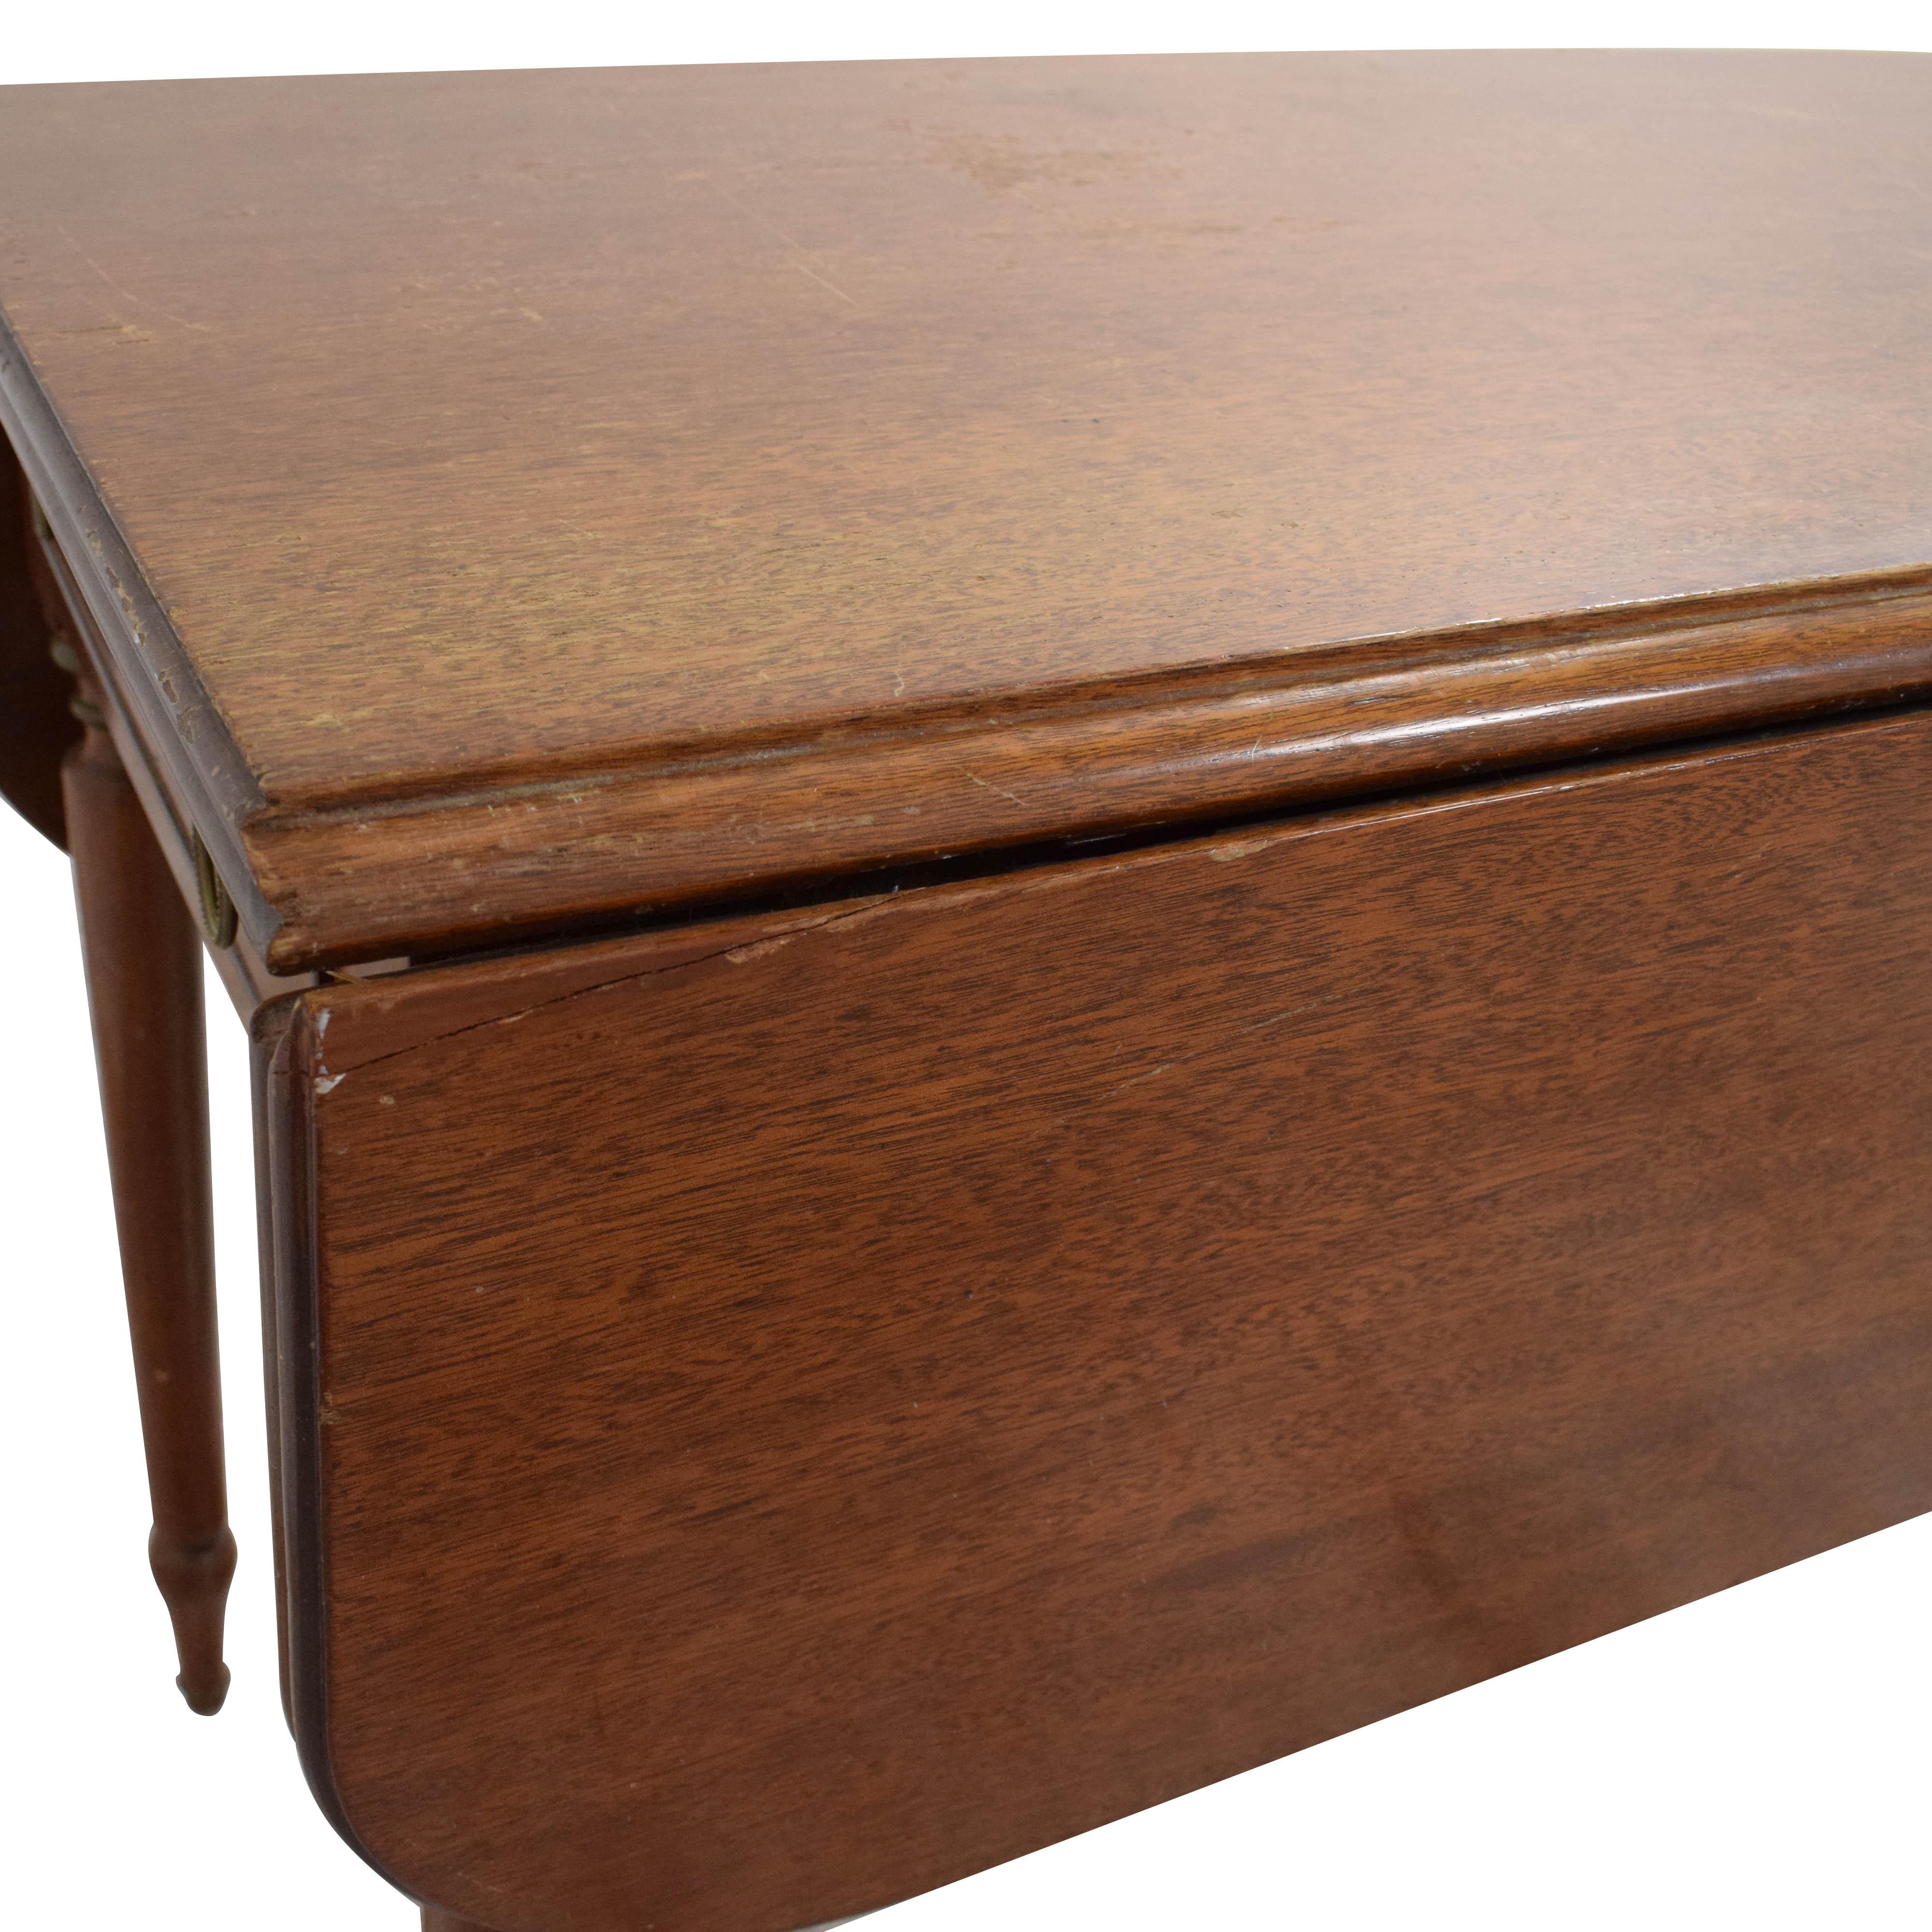 shop American Federal Drop Leaf Console Table A-America Wood Furniture